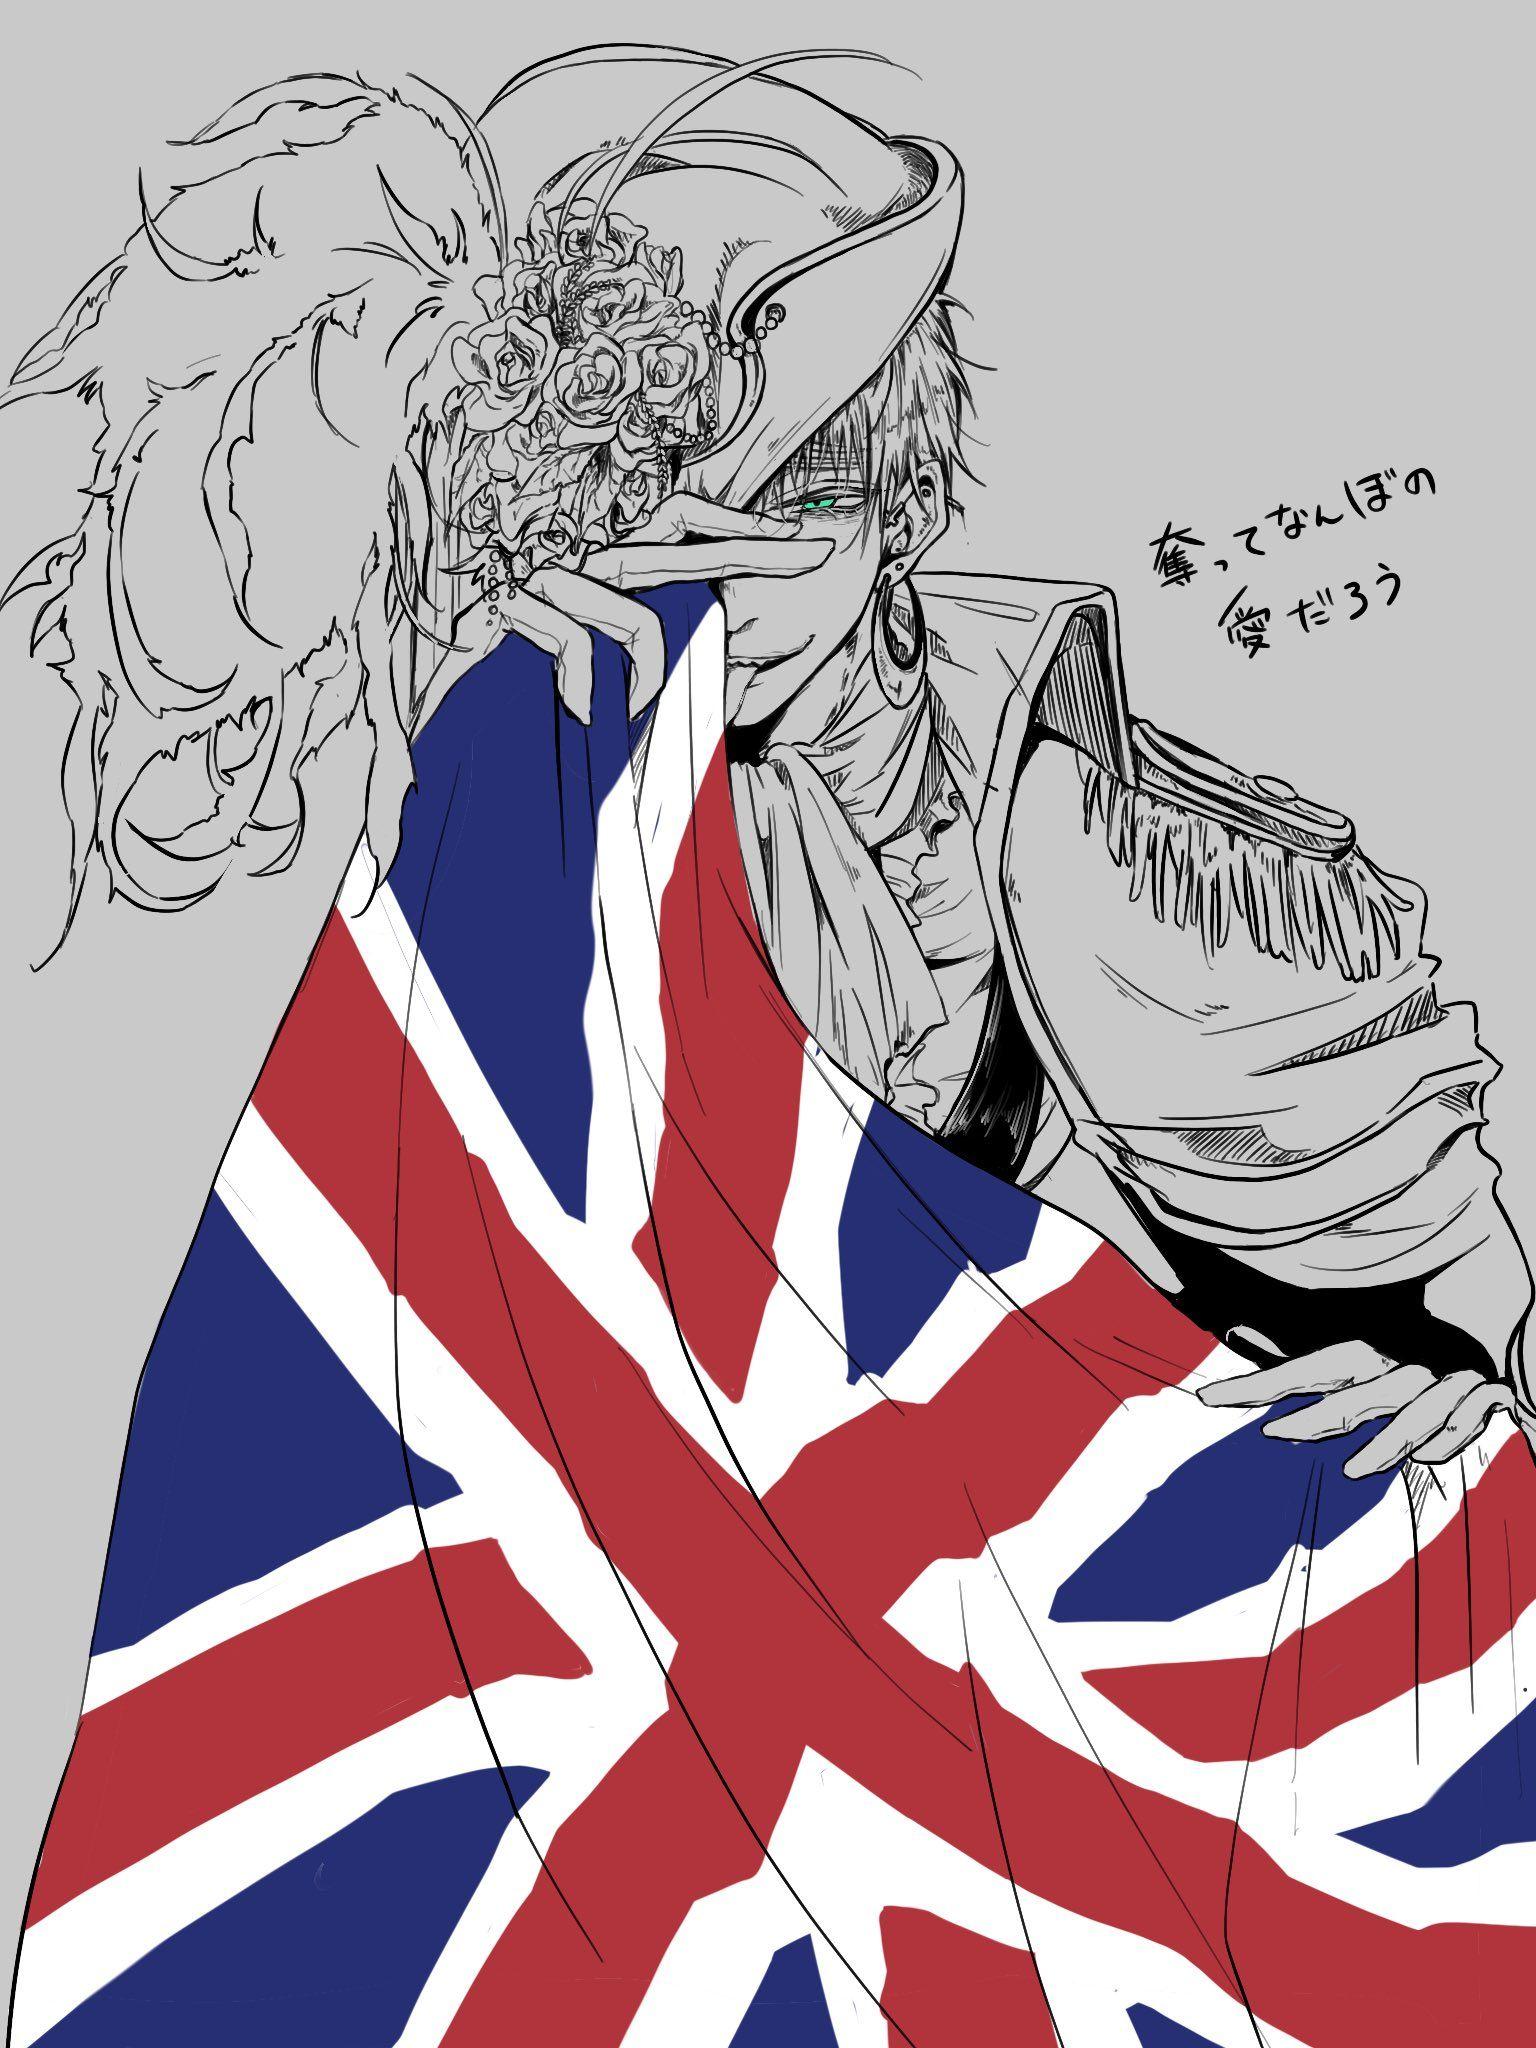 Pin by 赤さん on Hetalia in 2020 Hetalia anime, Hetalia